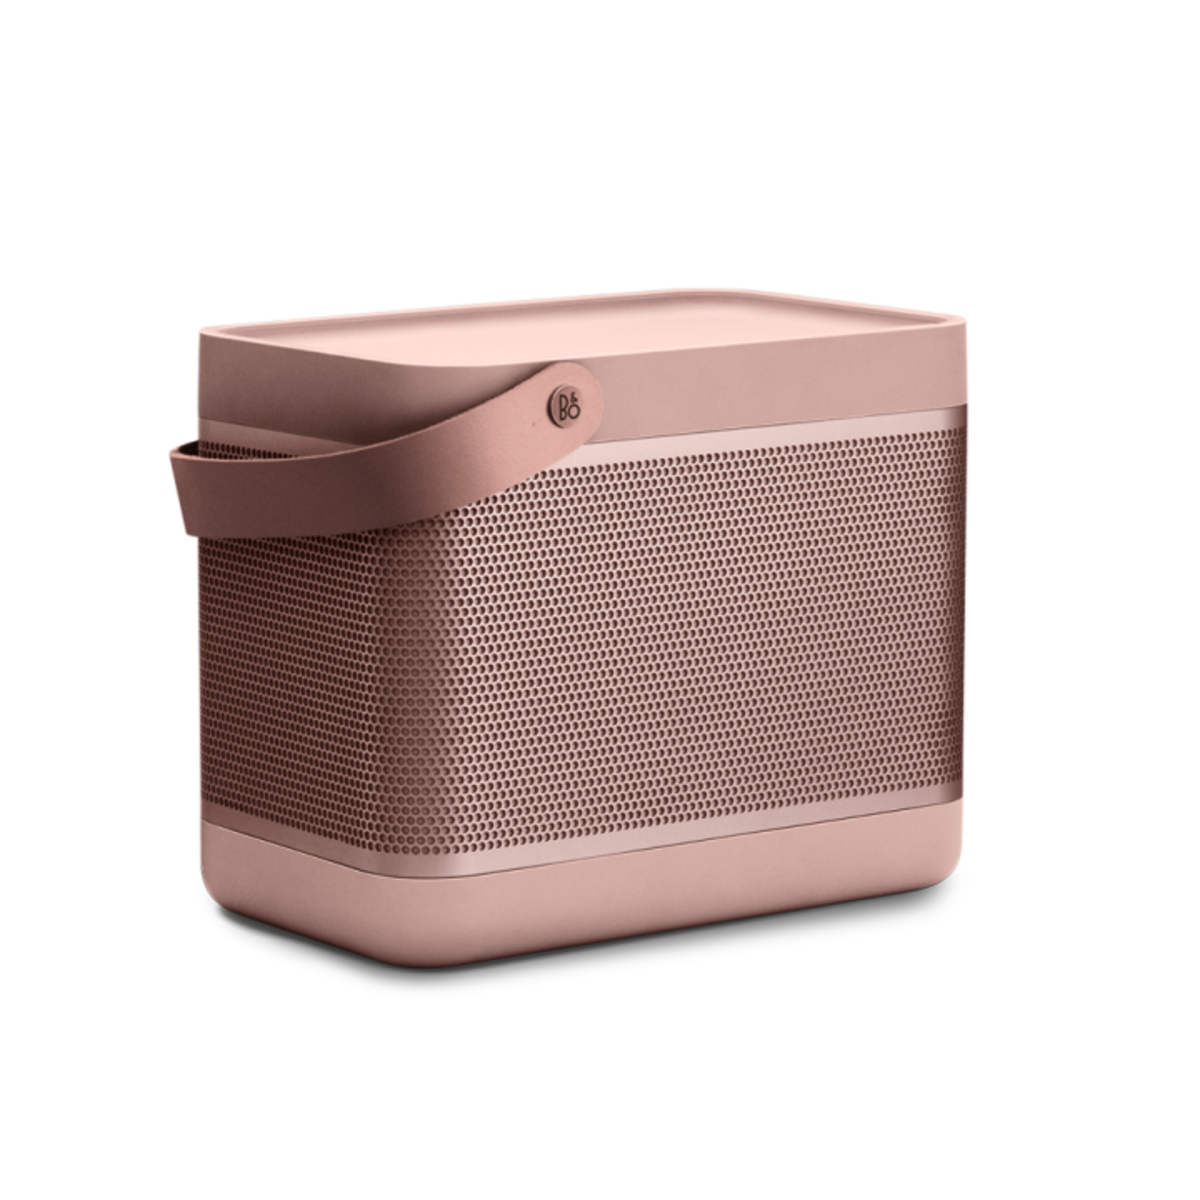 Beolit 17 Portable Bluetooth Speaker Pink Edtion